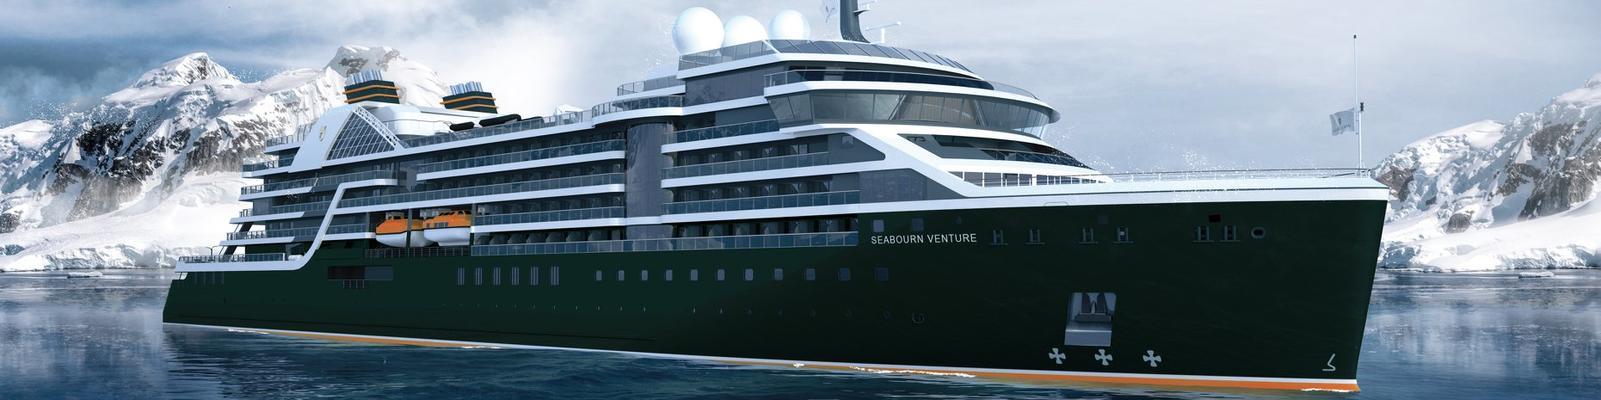 Seabourn Venture (Photo: Seabourn Cruise Line)